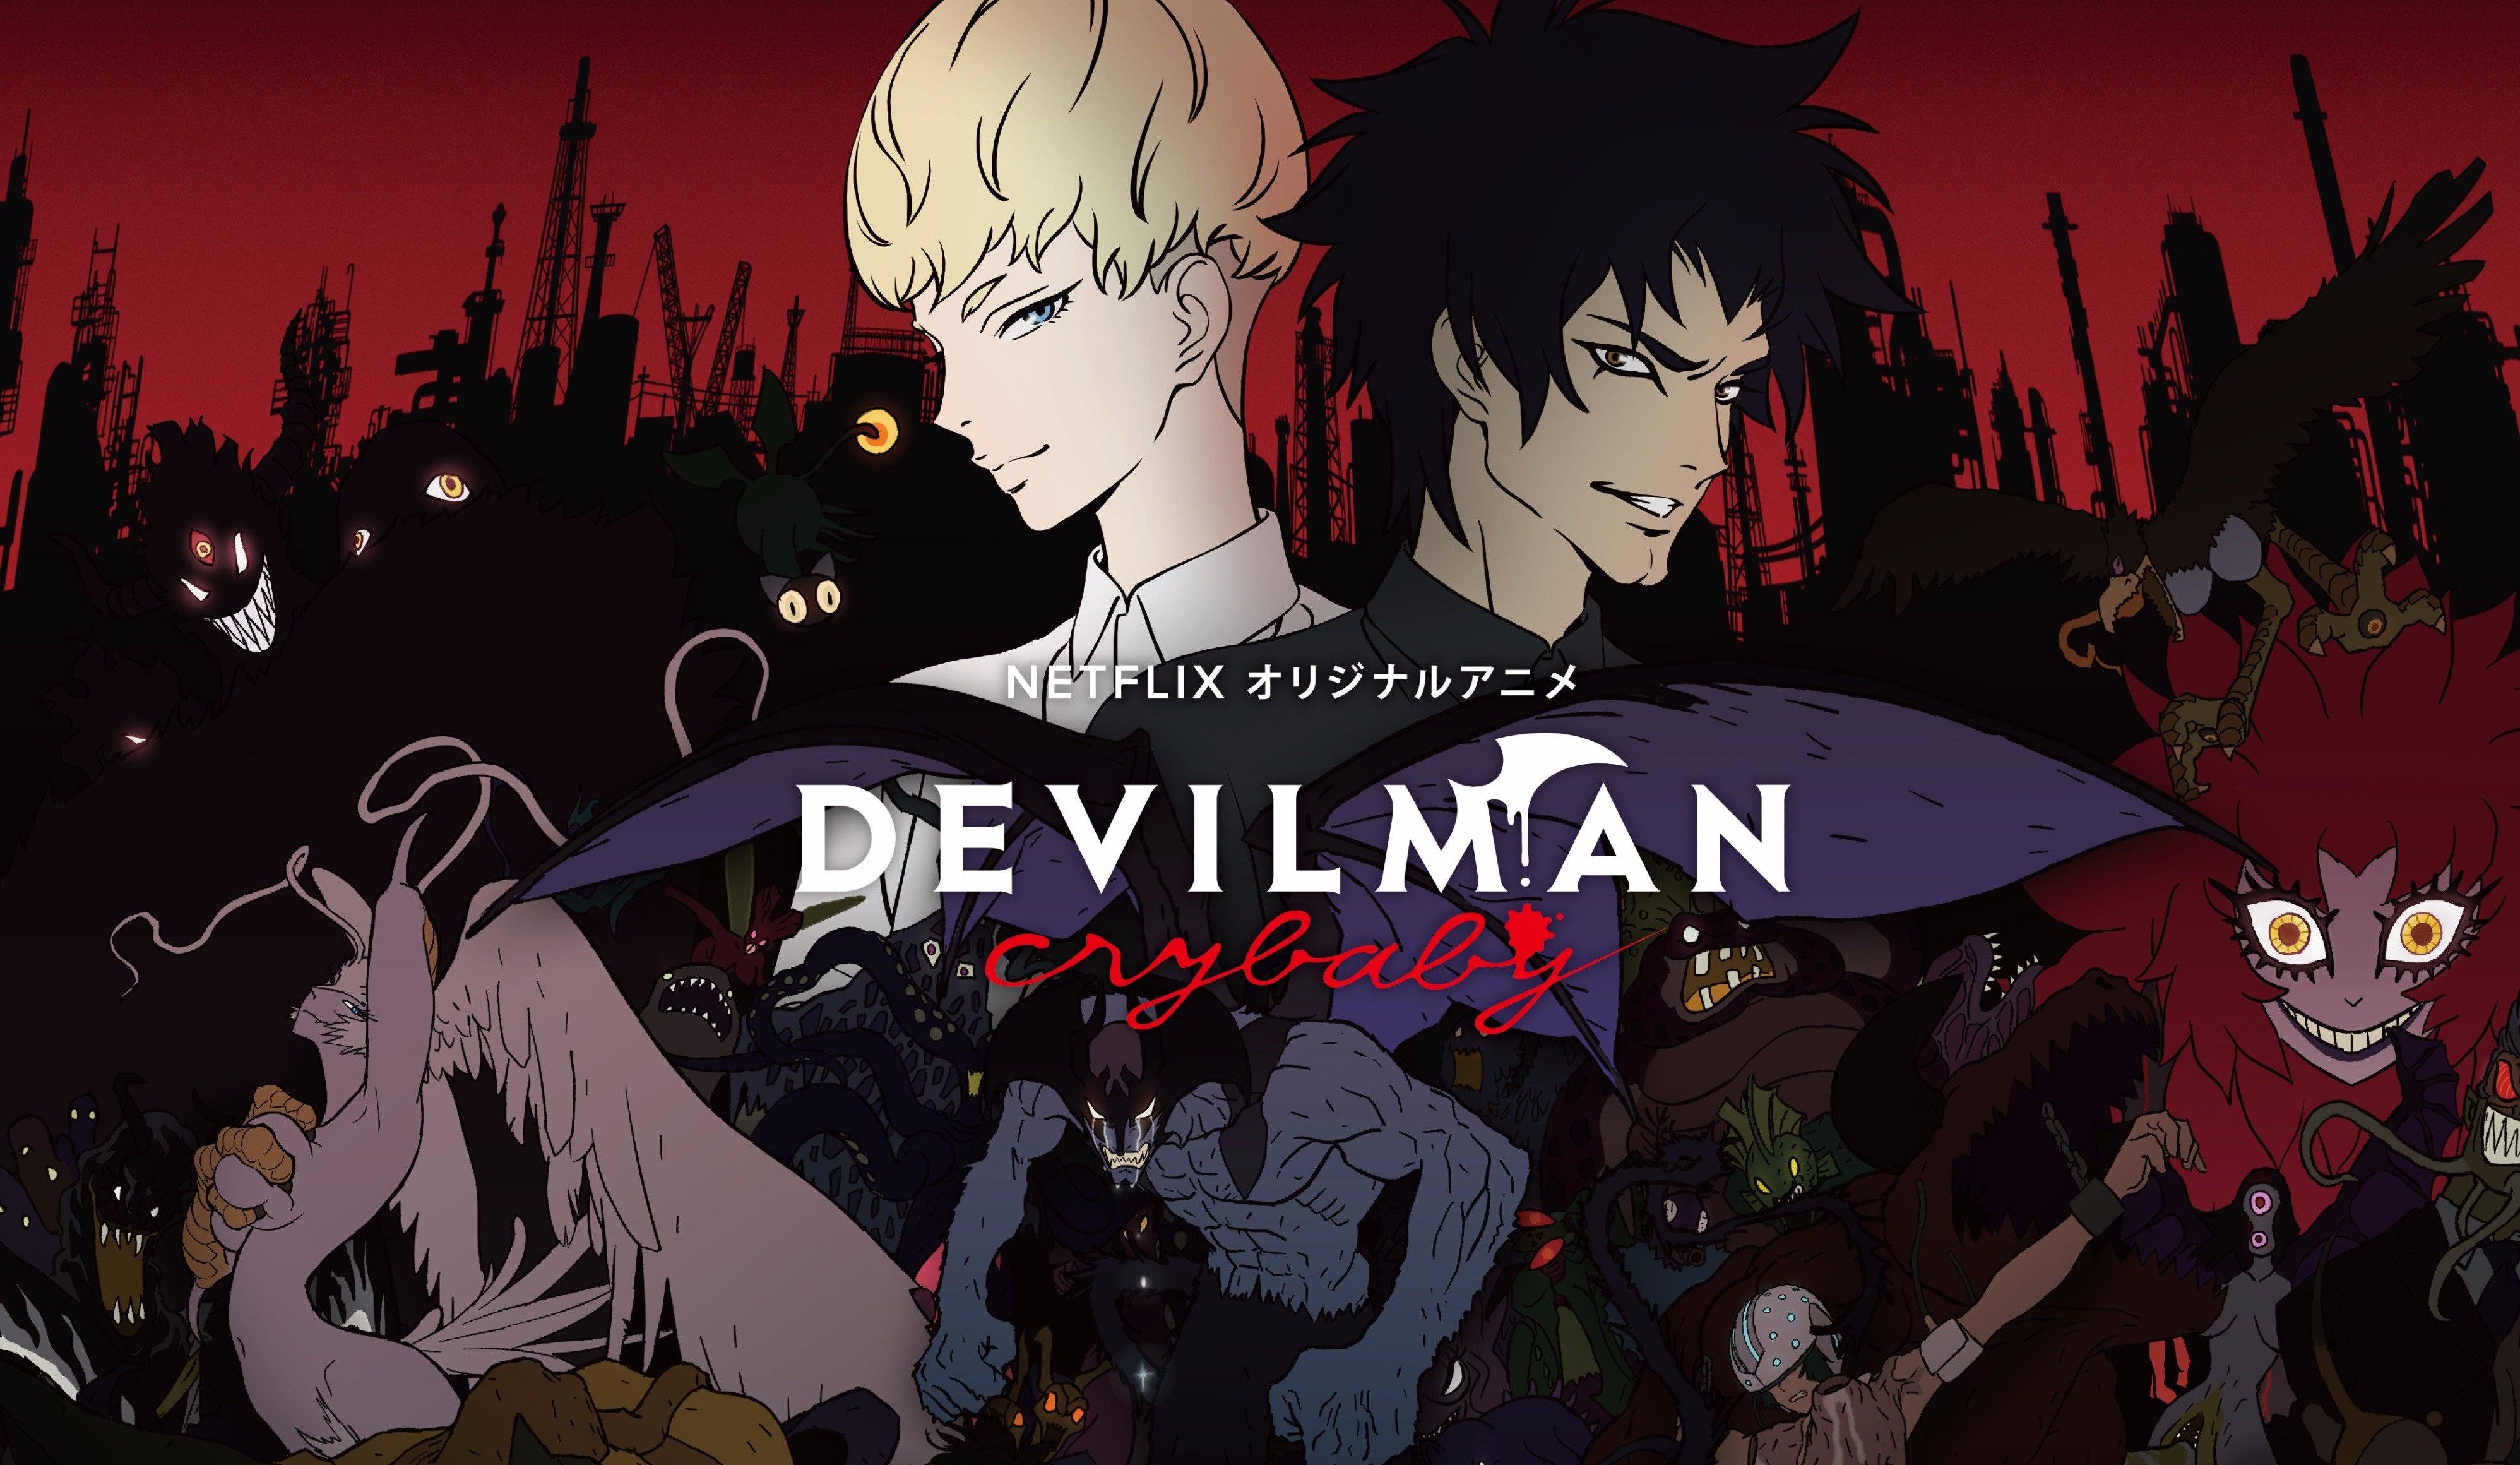 [TOP 30] - Os Melhores Animes de 2018 DPMA97tUEAAesMc